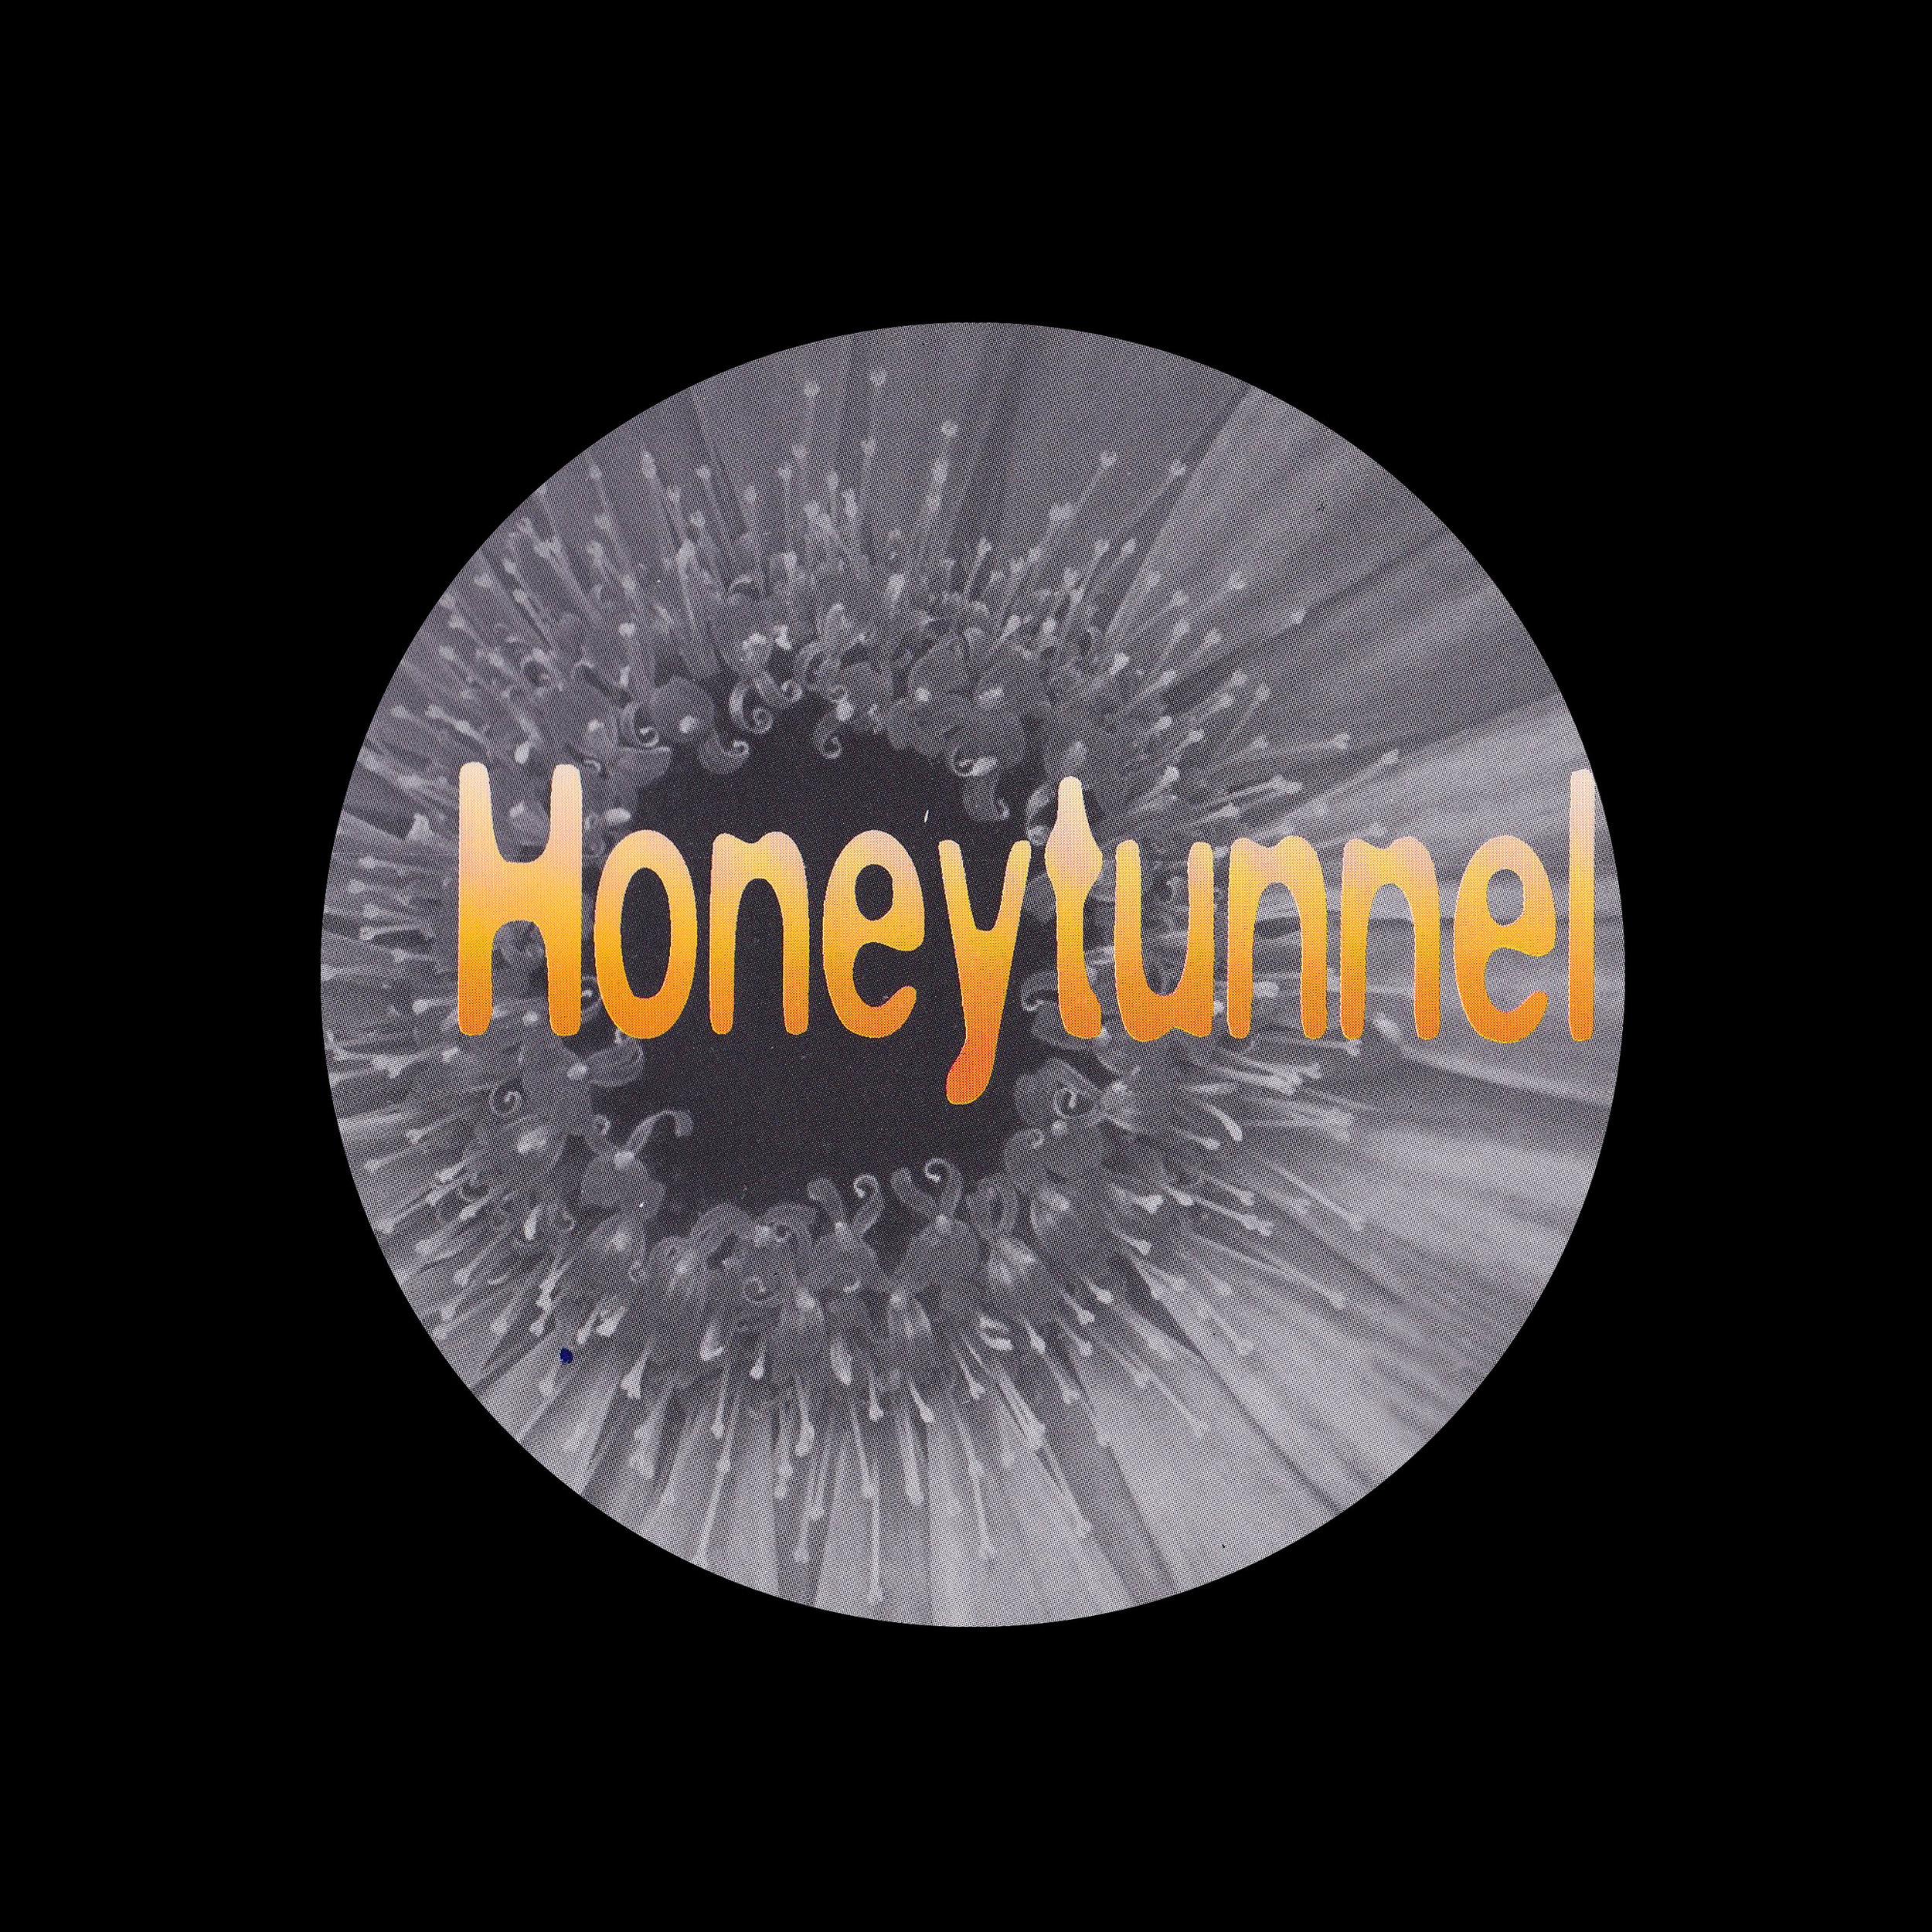 "Honeytunnel - Solace 7"" Single"